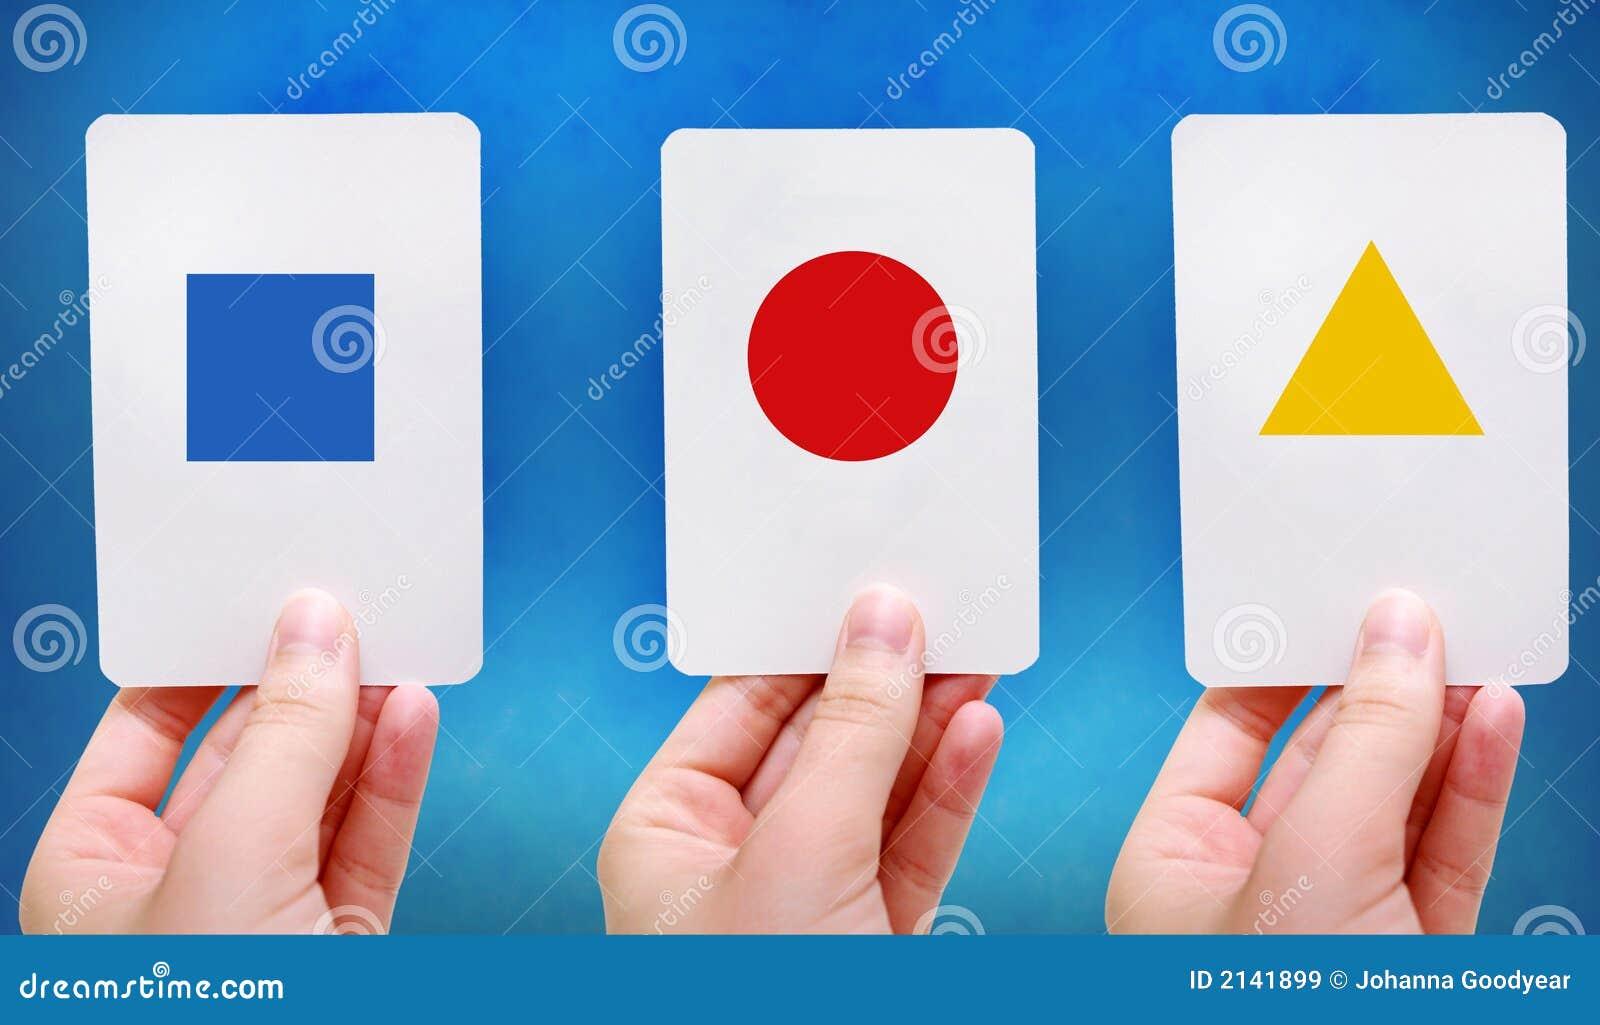 worksheet Shape Flash Cards shapes flash cards royalty free stock images image 2141899 cards